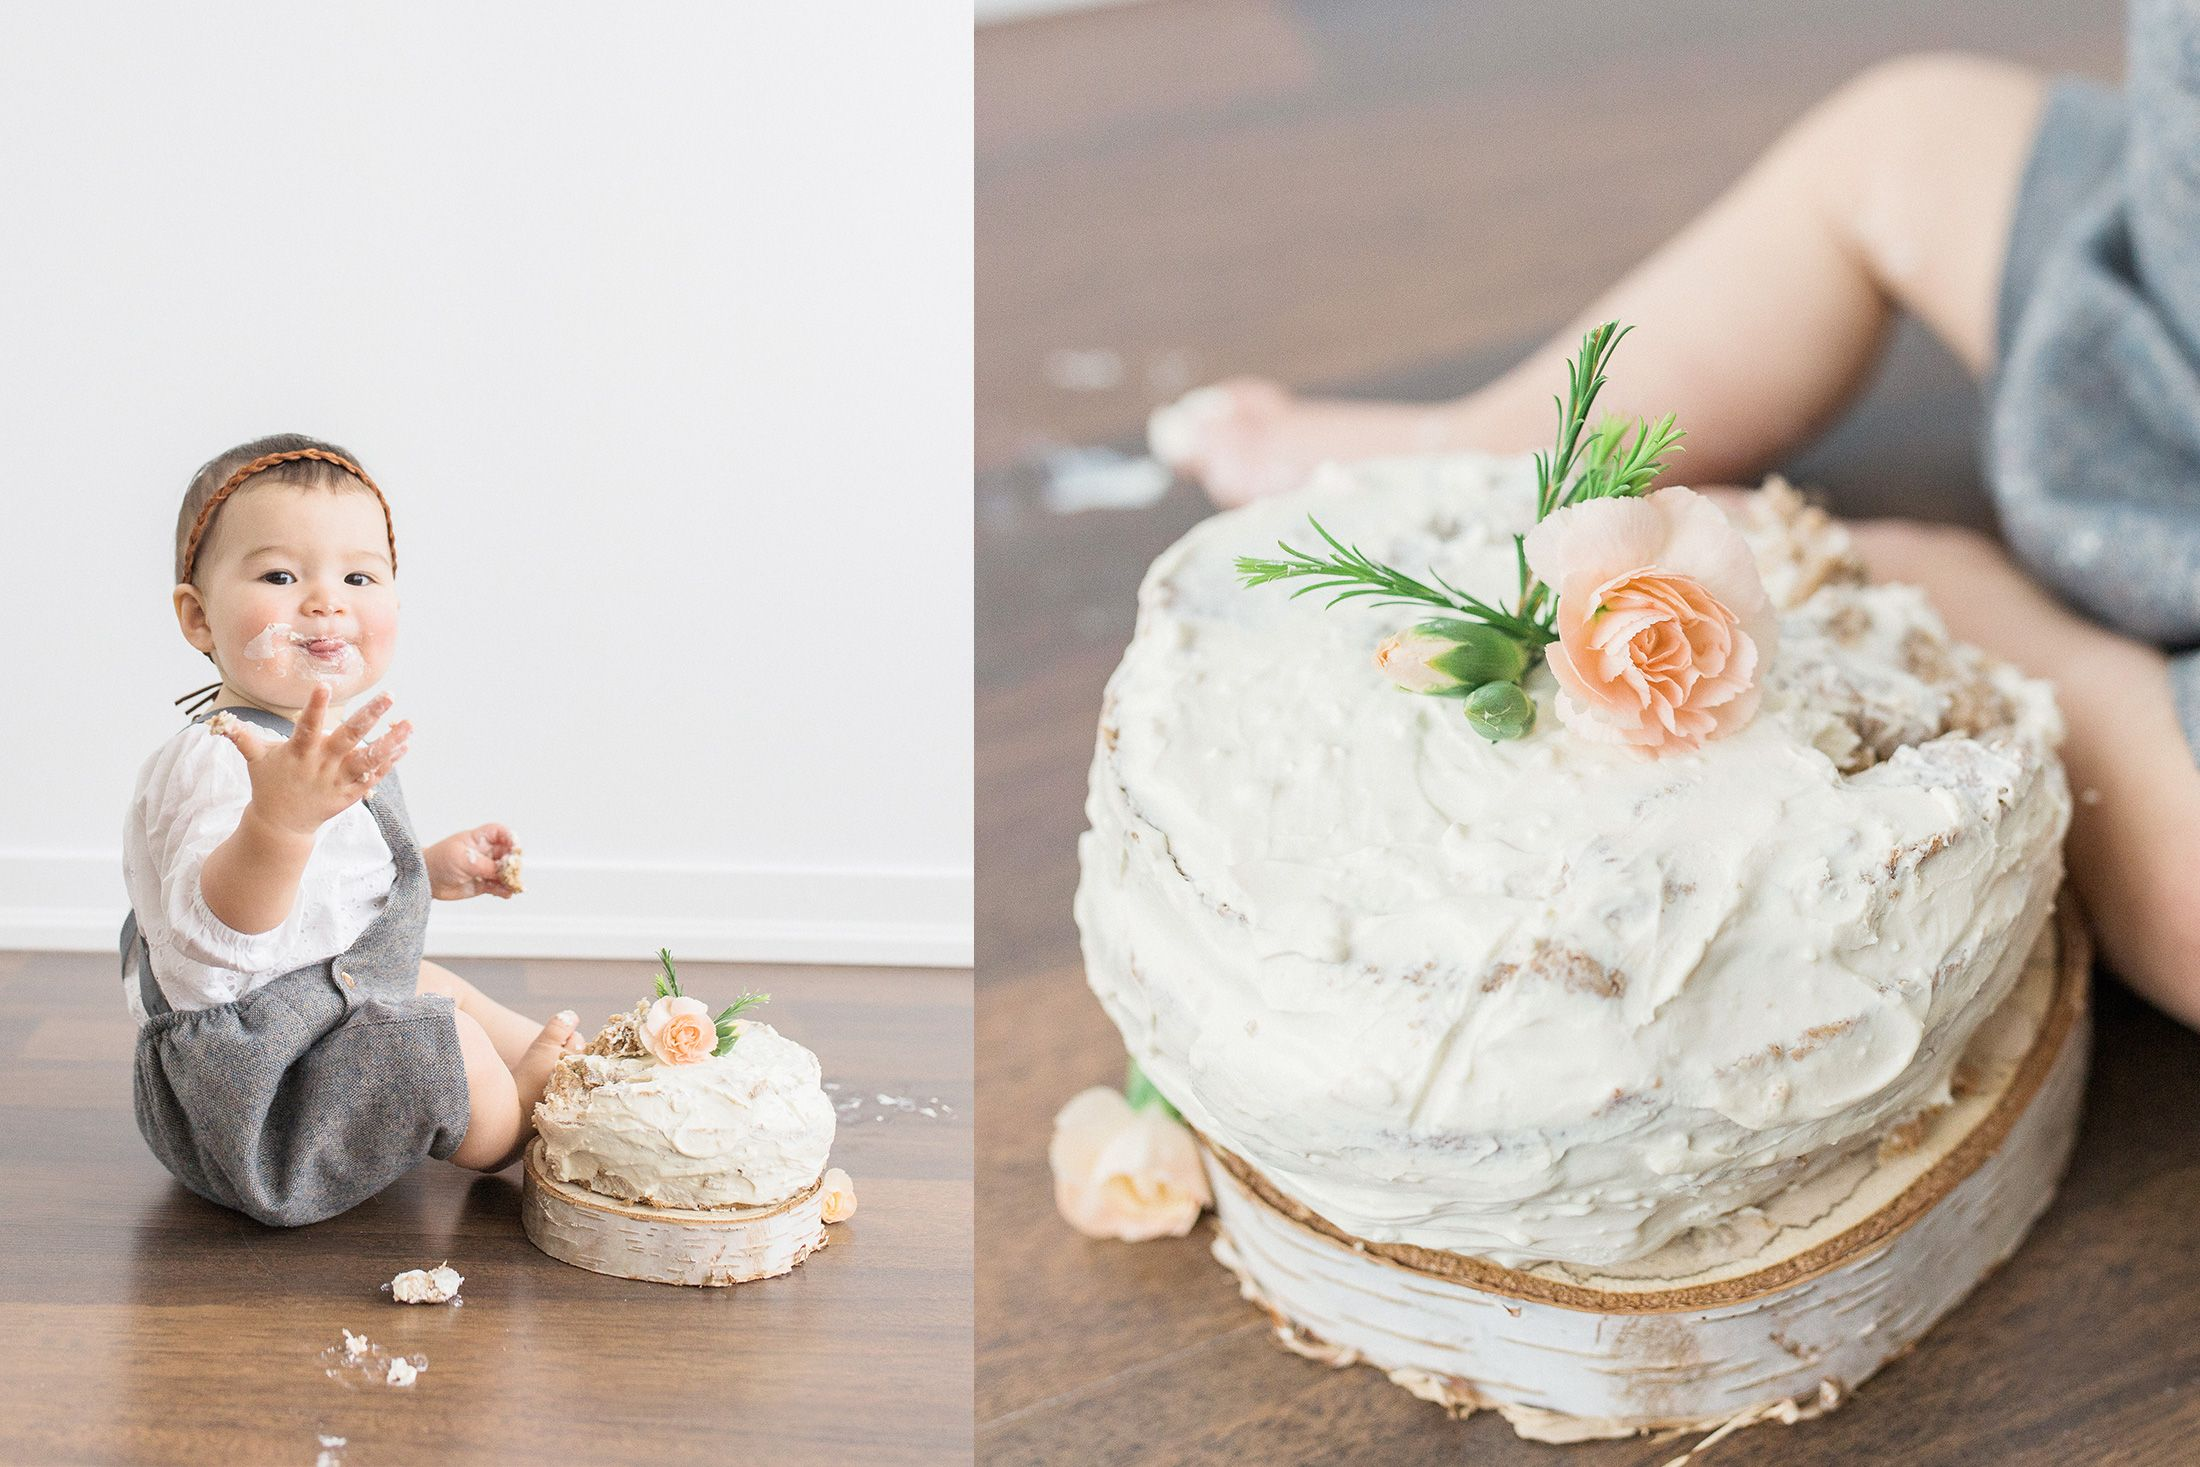 Recipe Healthy Sugar Free Smash Cake For Baby S Birthday